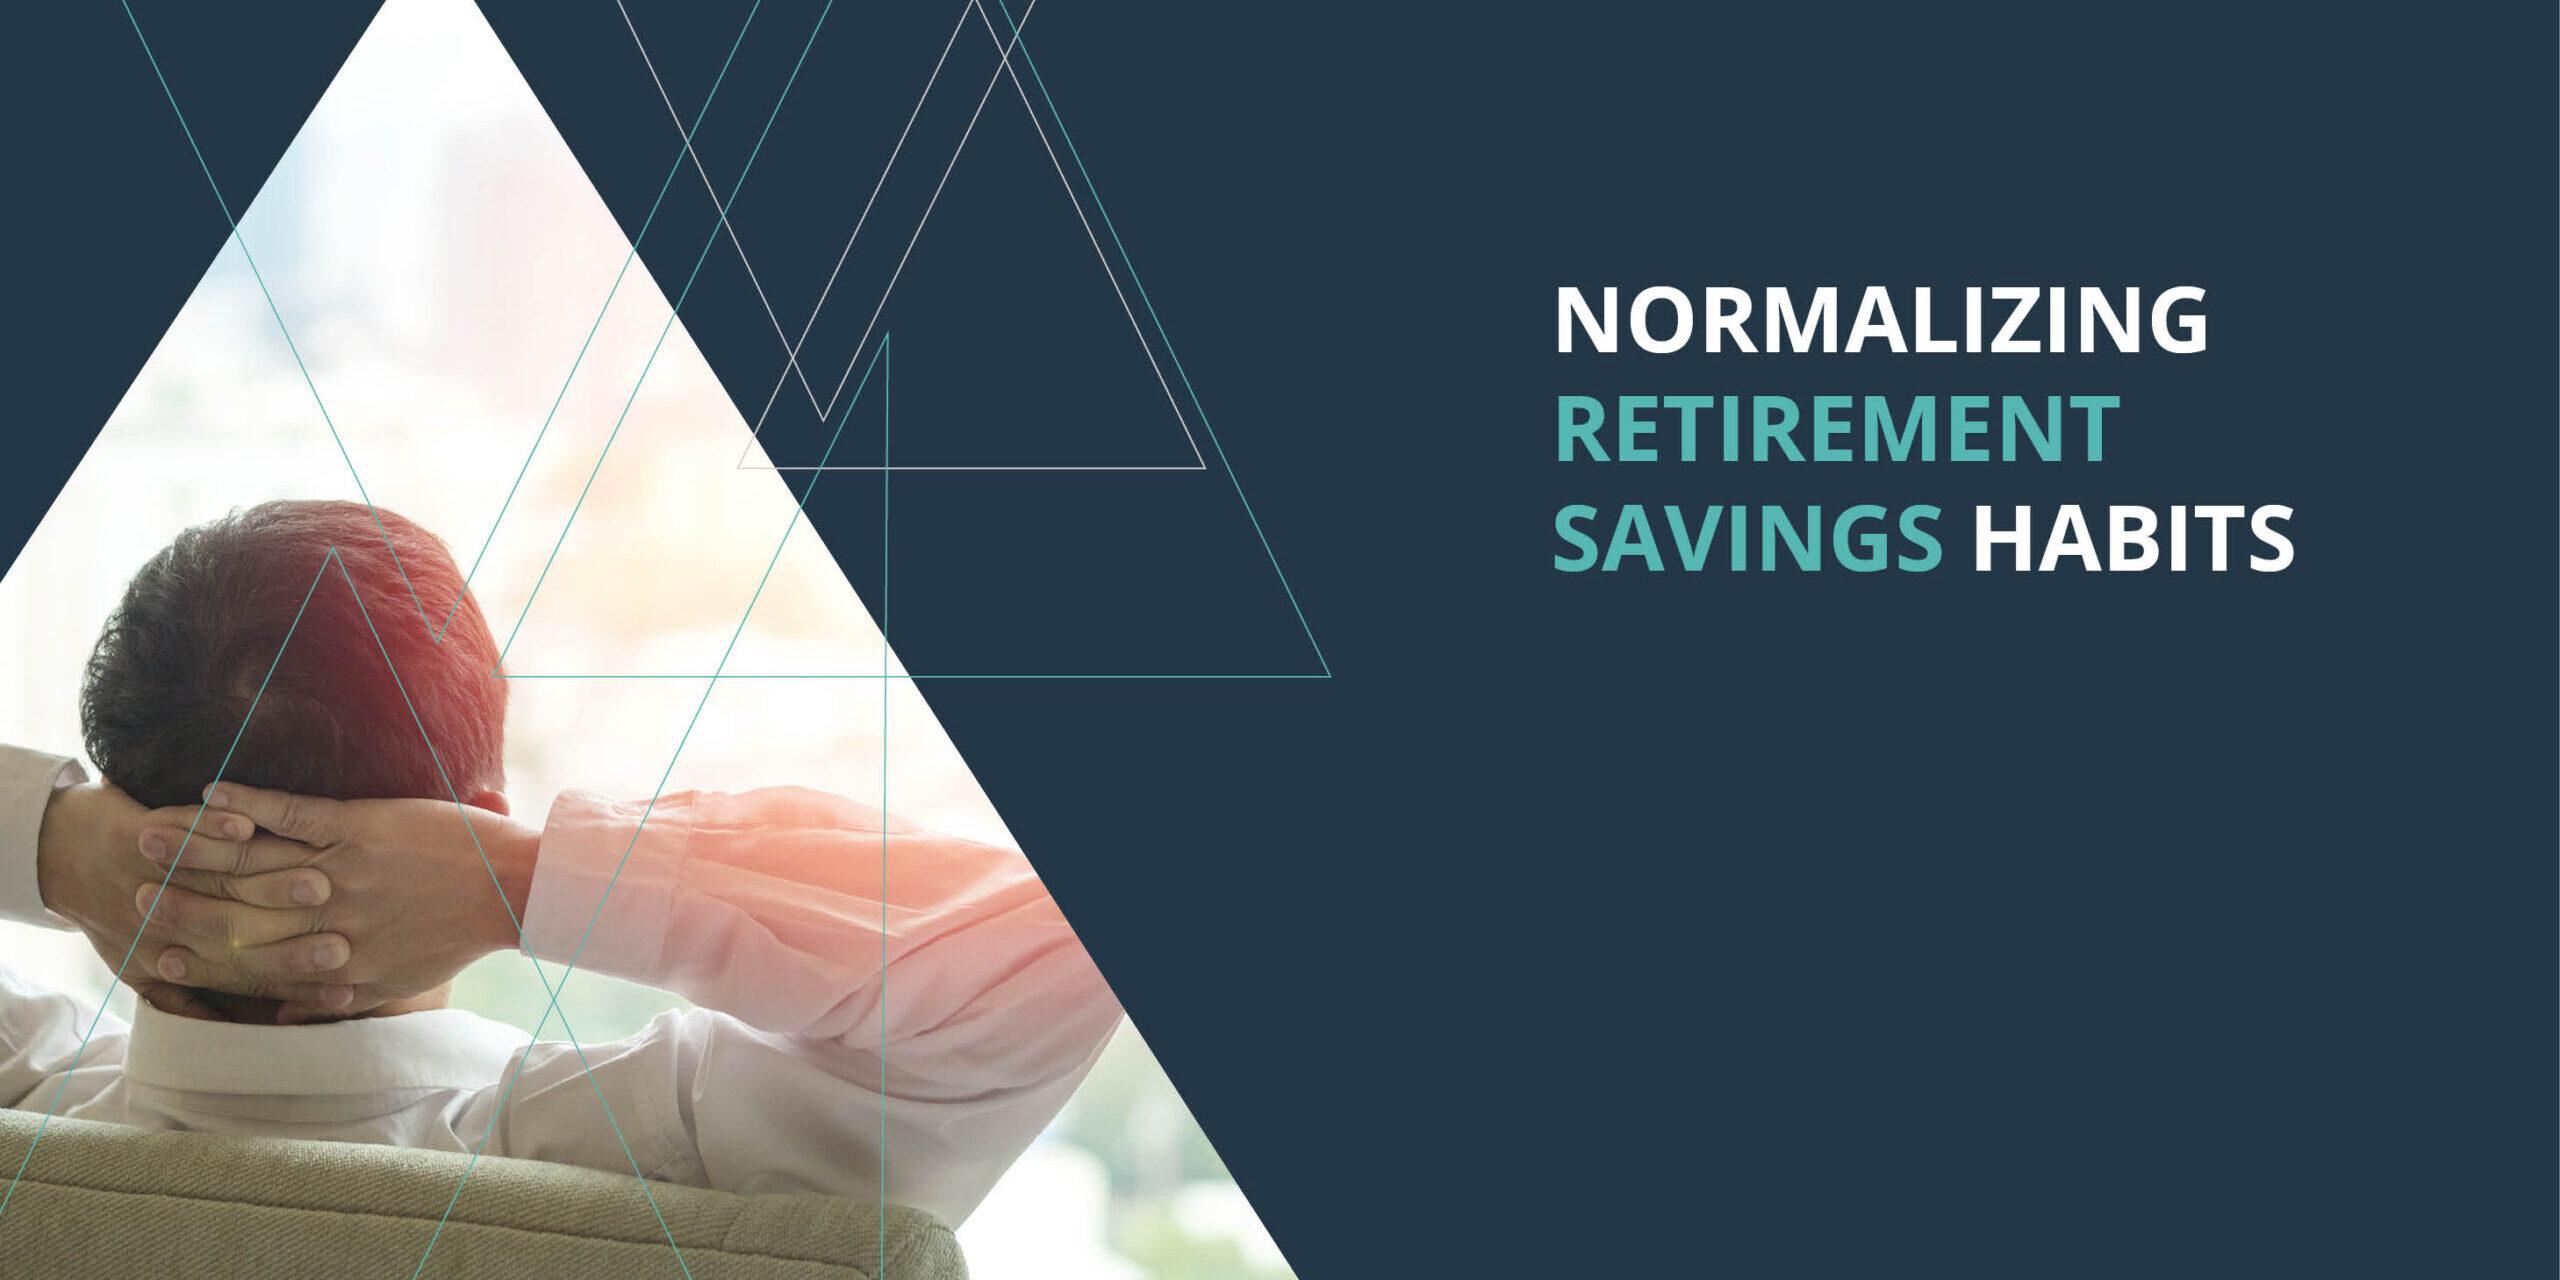 Headline Image 2 - Normalize Retirement Savings Habits